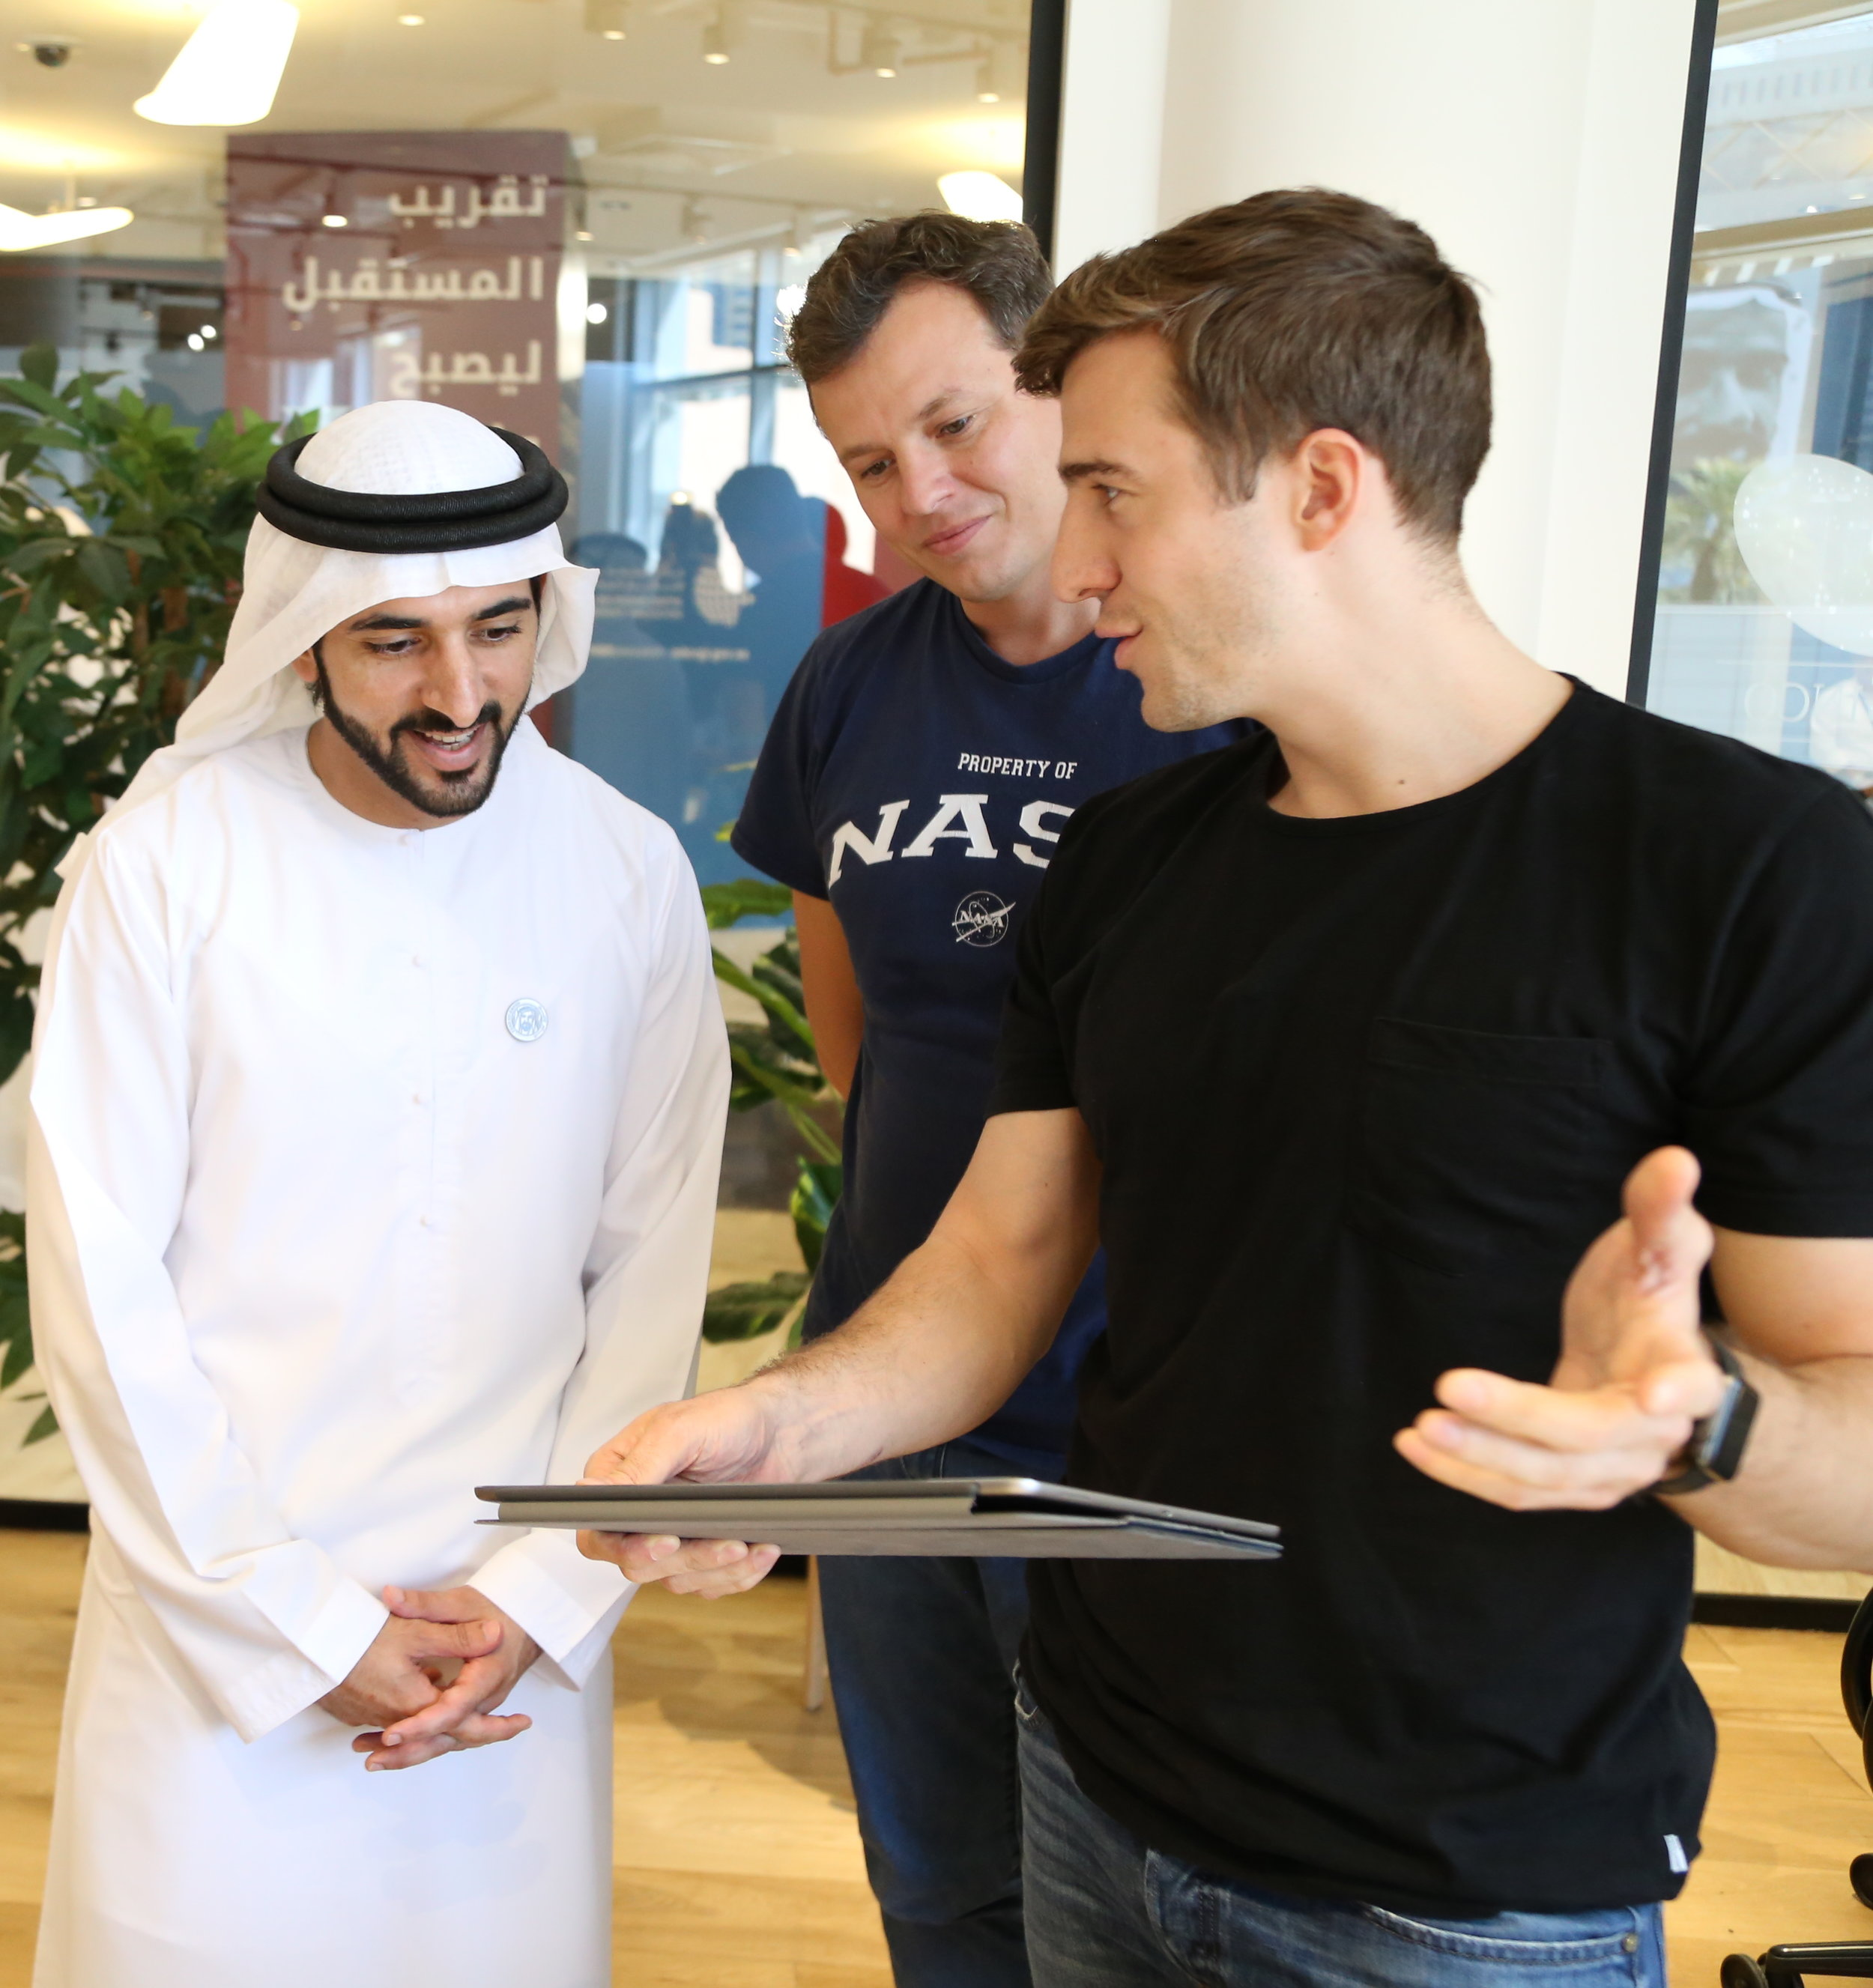 His Highness Sheikh Hamdan bin Mohammed bin Rashid Al Maktoum, Crown Prince of Dubai visits the Accelerator to discuss autonomous eVTOL vehicles with Alex Xydas of FlugAuto